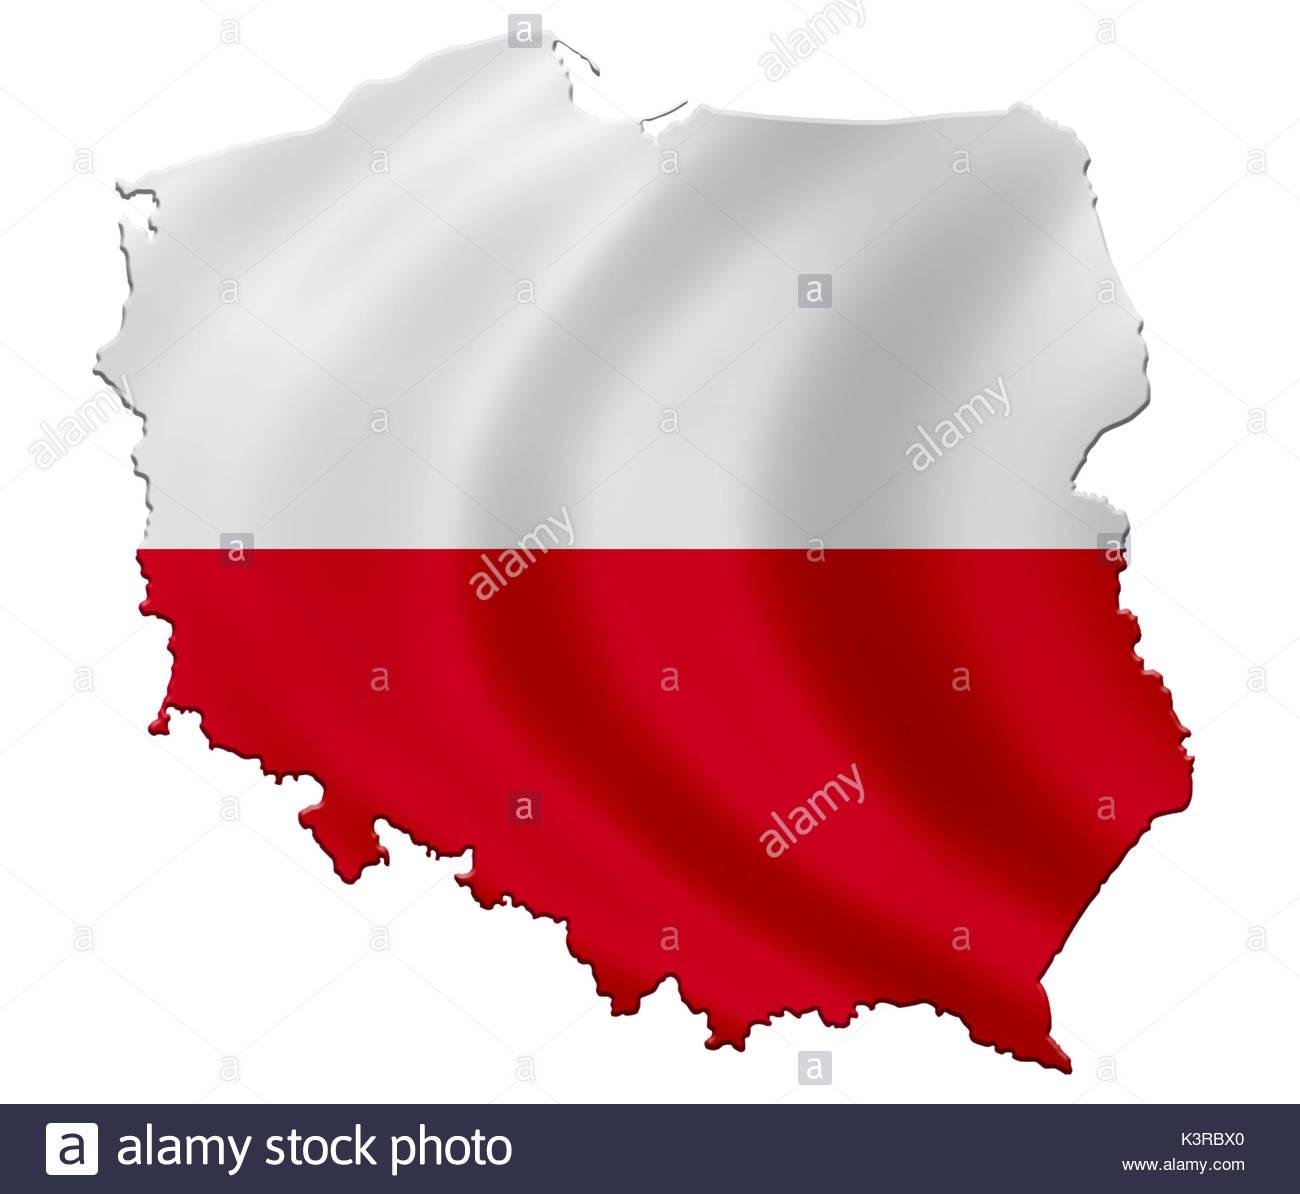 Poland Map Flag Stock Photos & Poland Map Flag Stock Images - Alamy